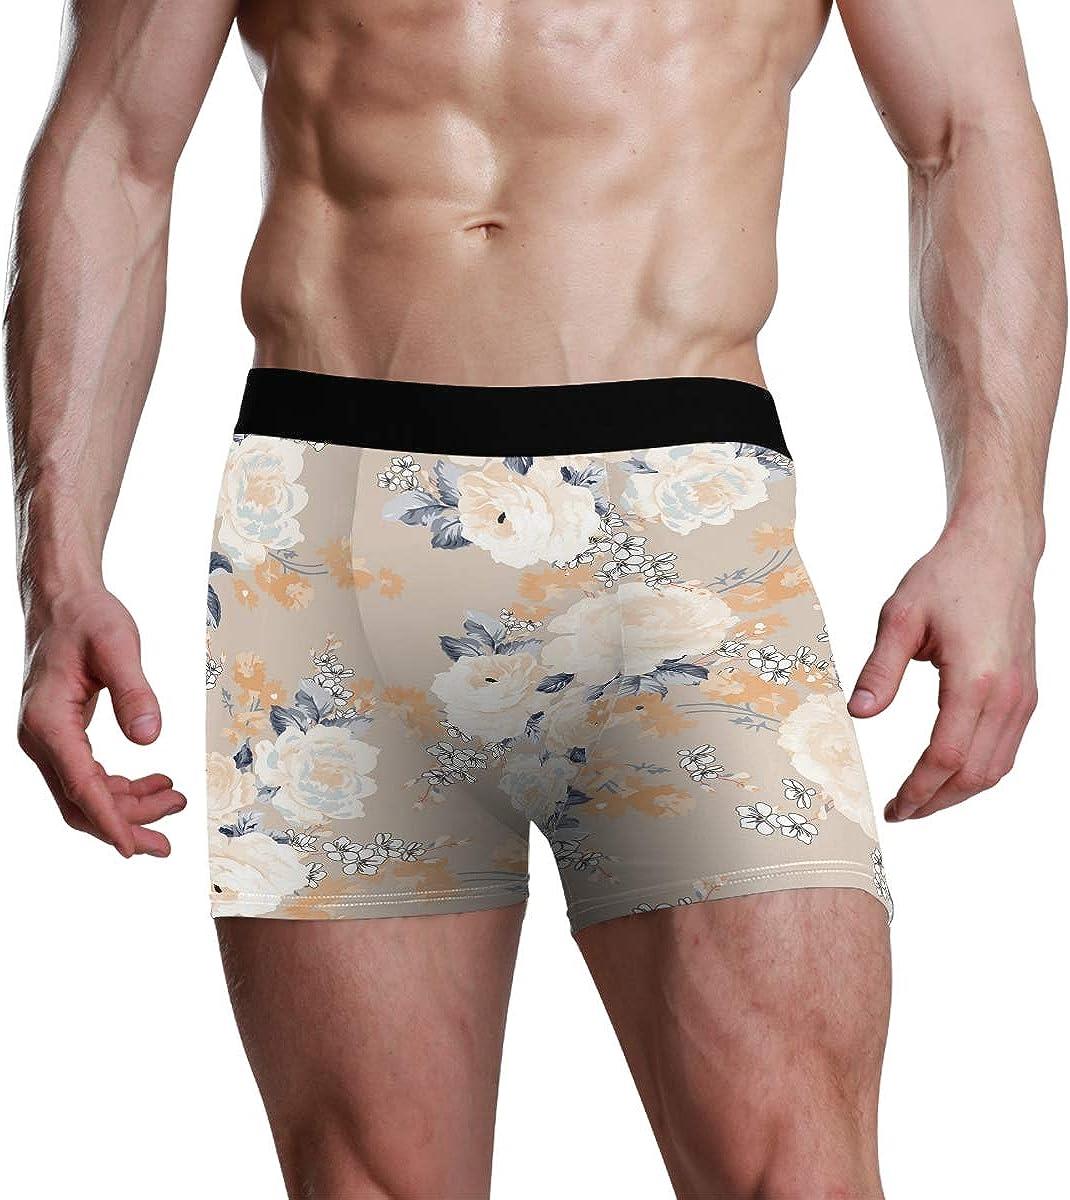 HangWang Men's Underwear Seamless Rose Pattern Flowers Breathable Boxer Briefs Low Rise Long Leg